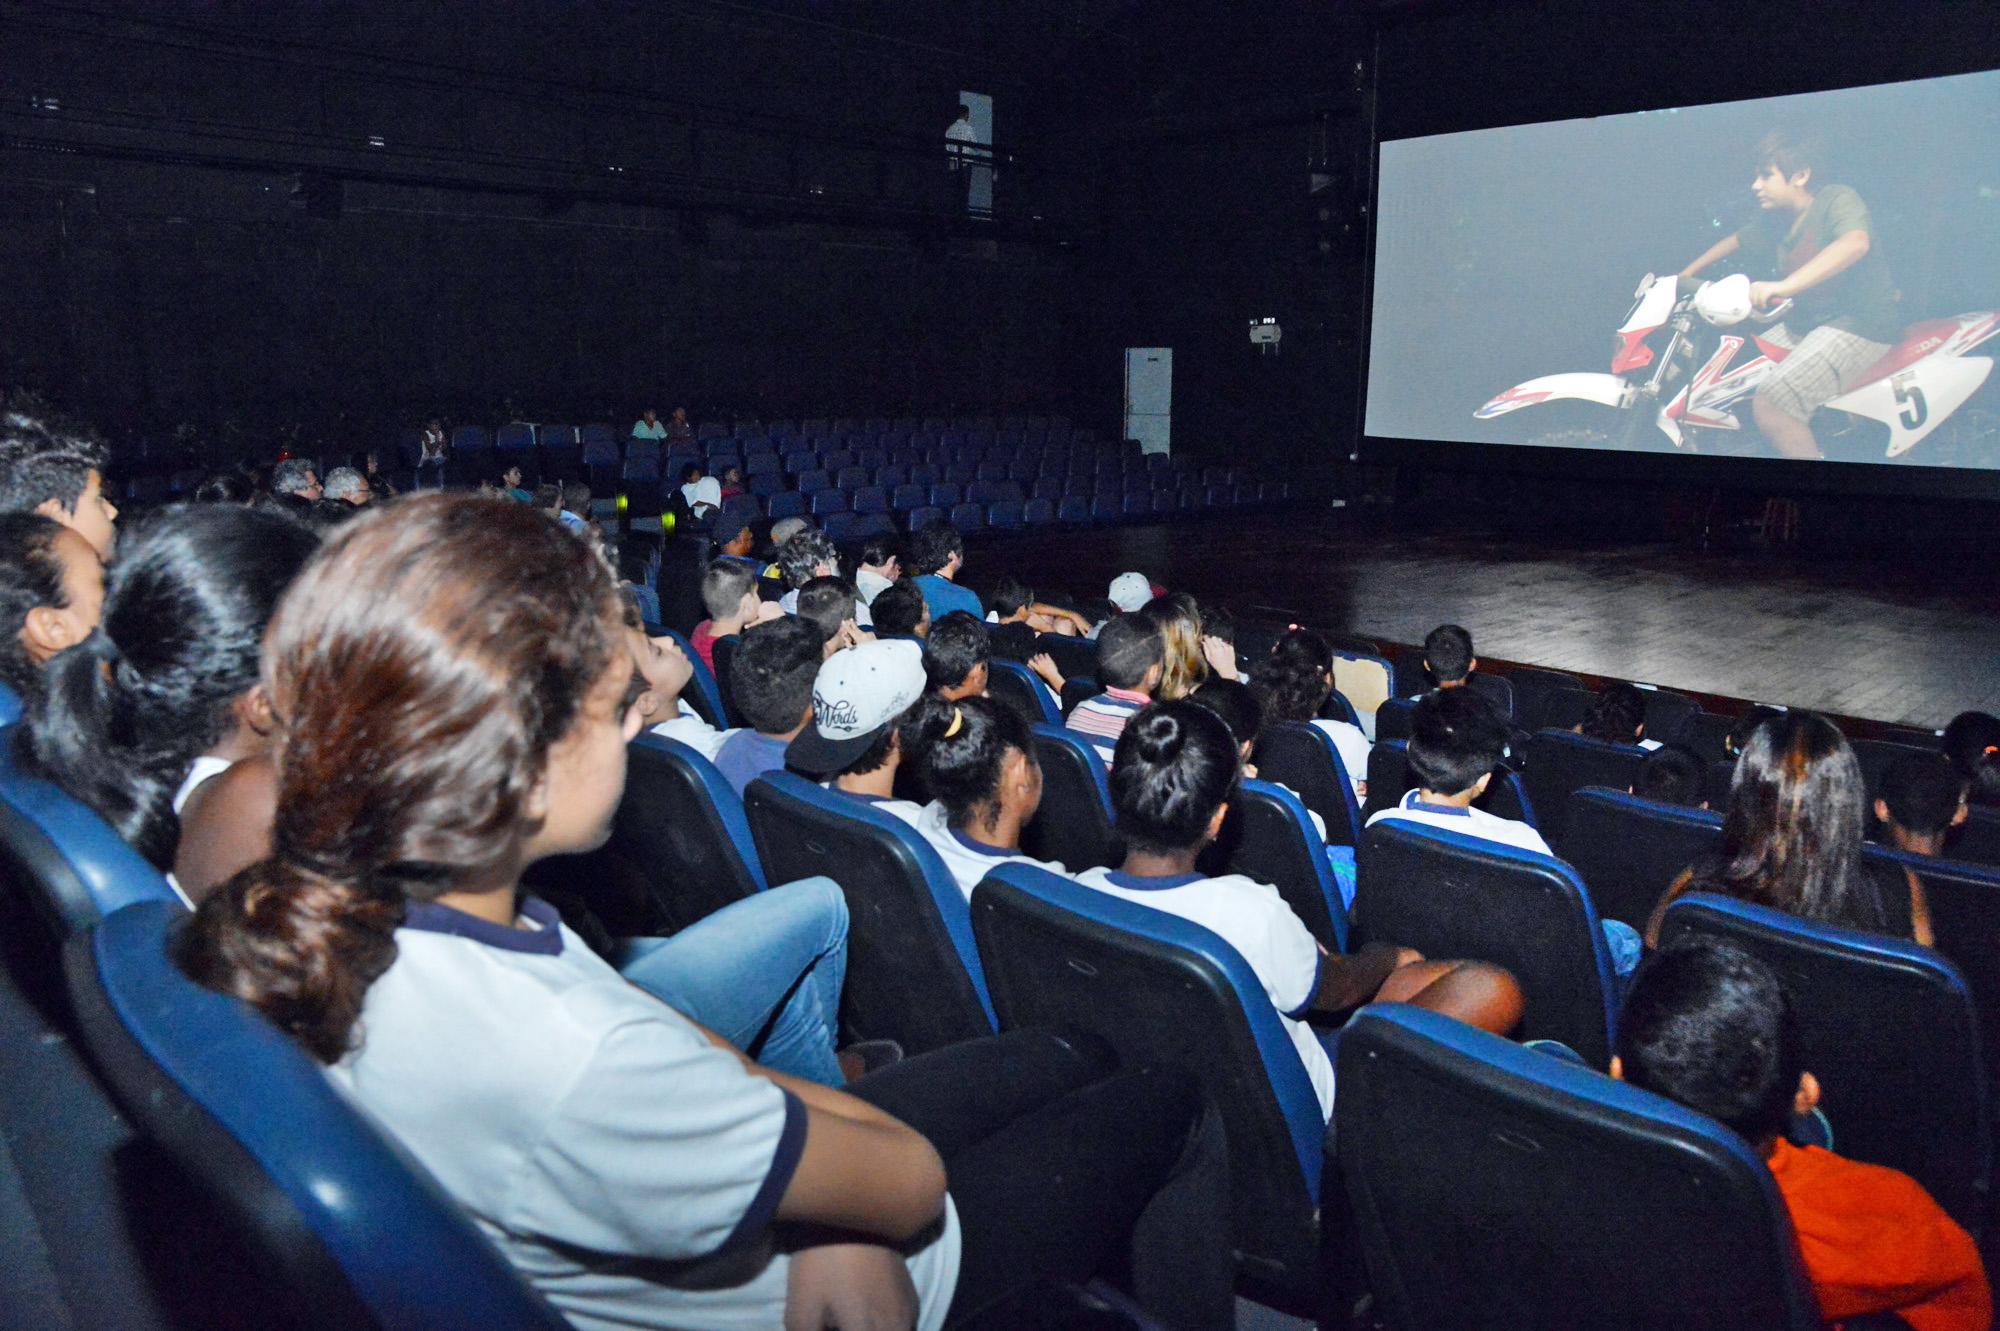 Circuito Sp Cine : Recorde de público marca aniversário do circuito spcine